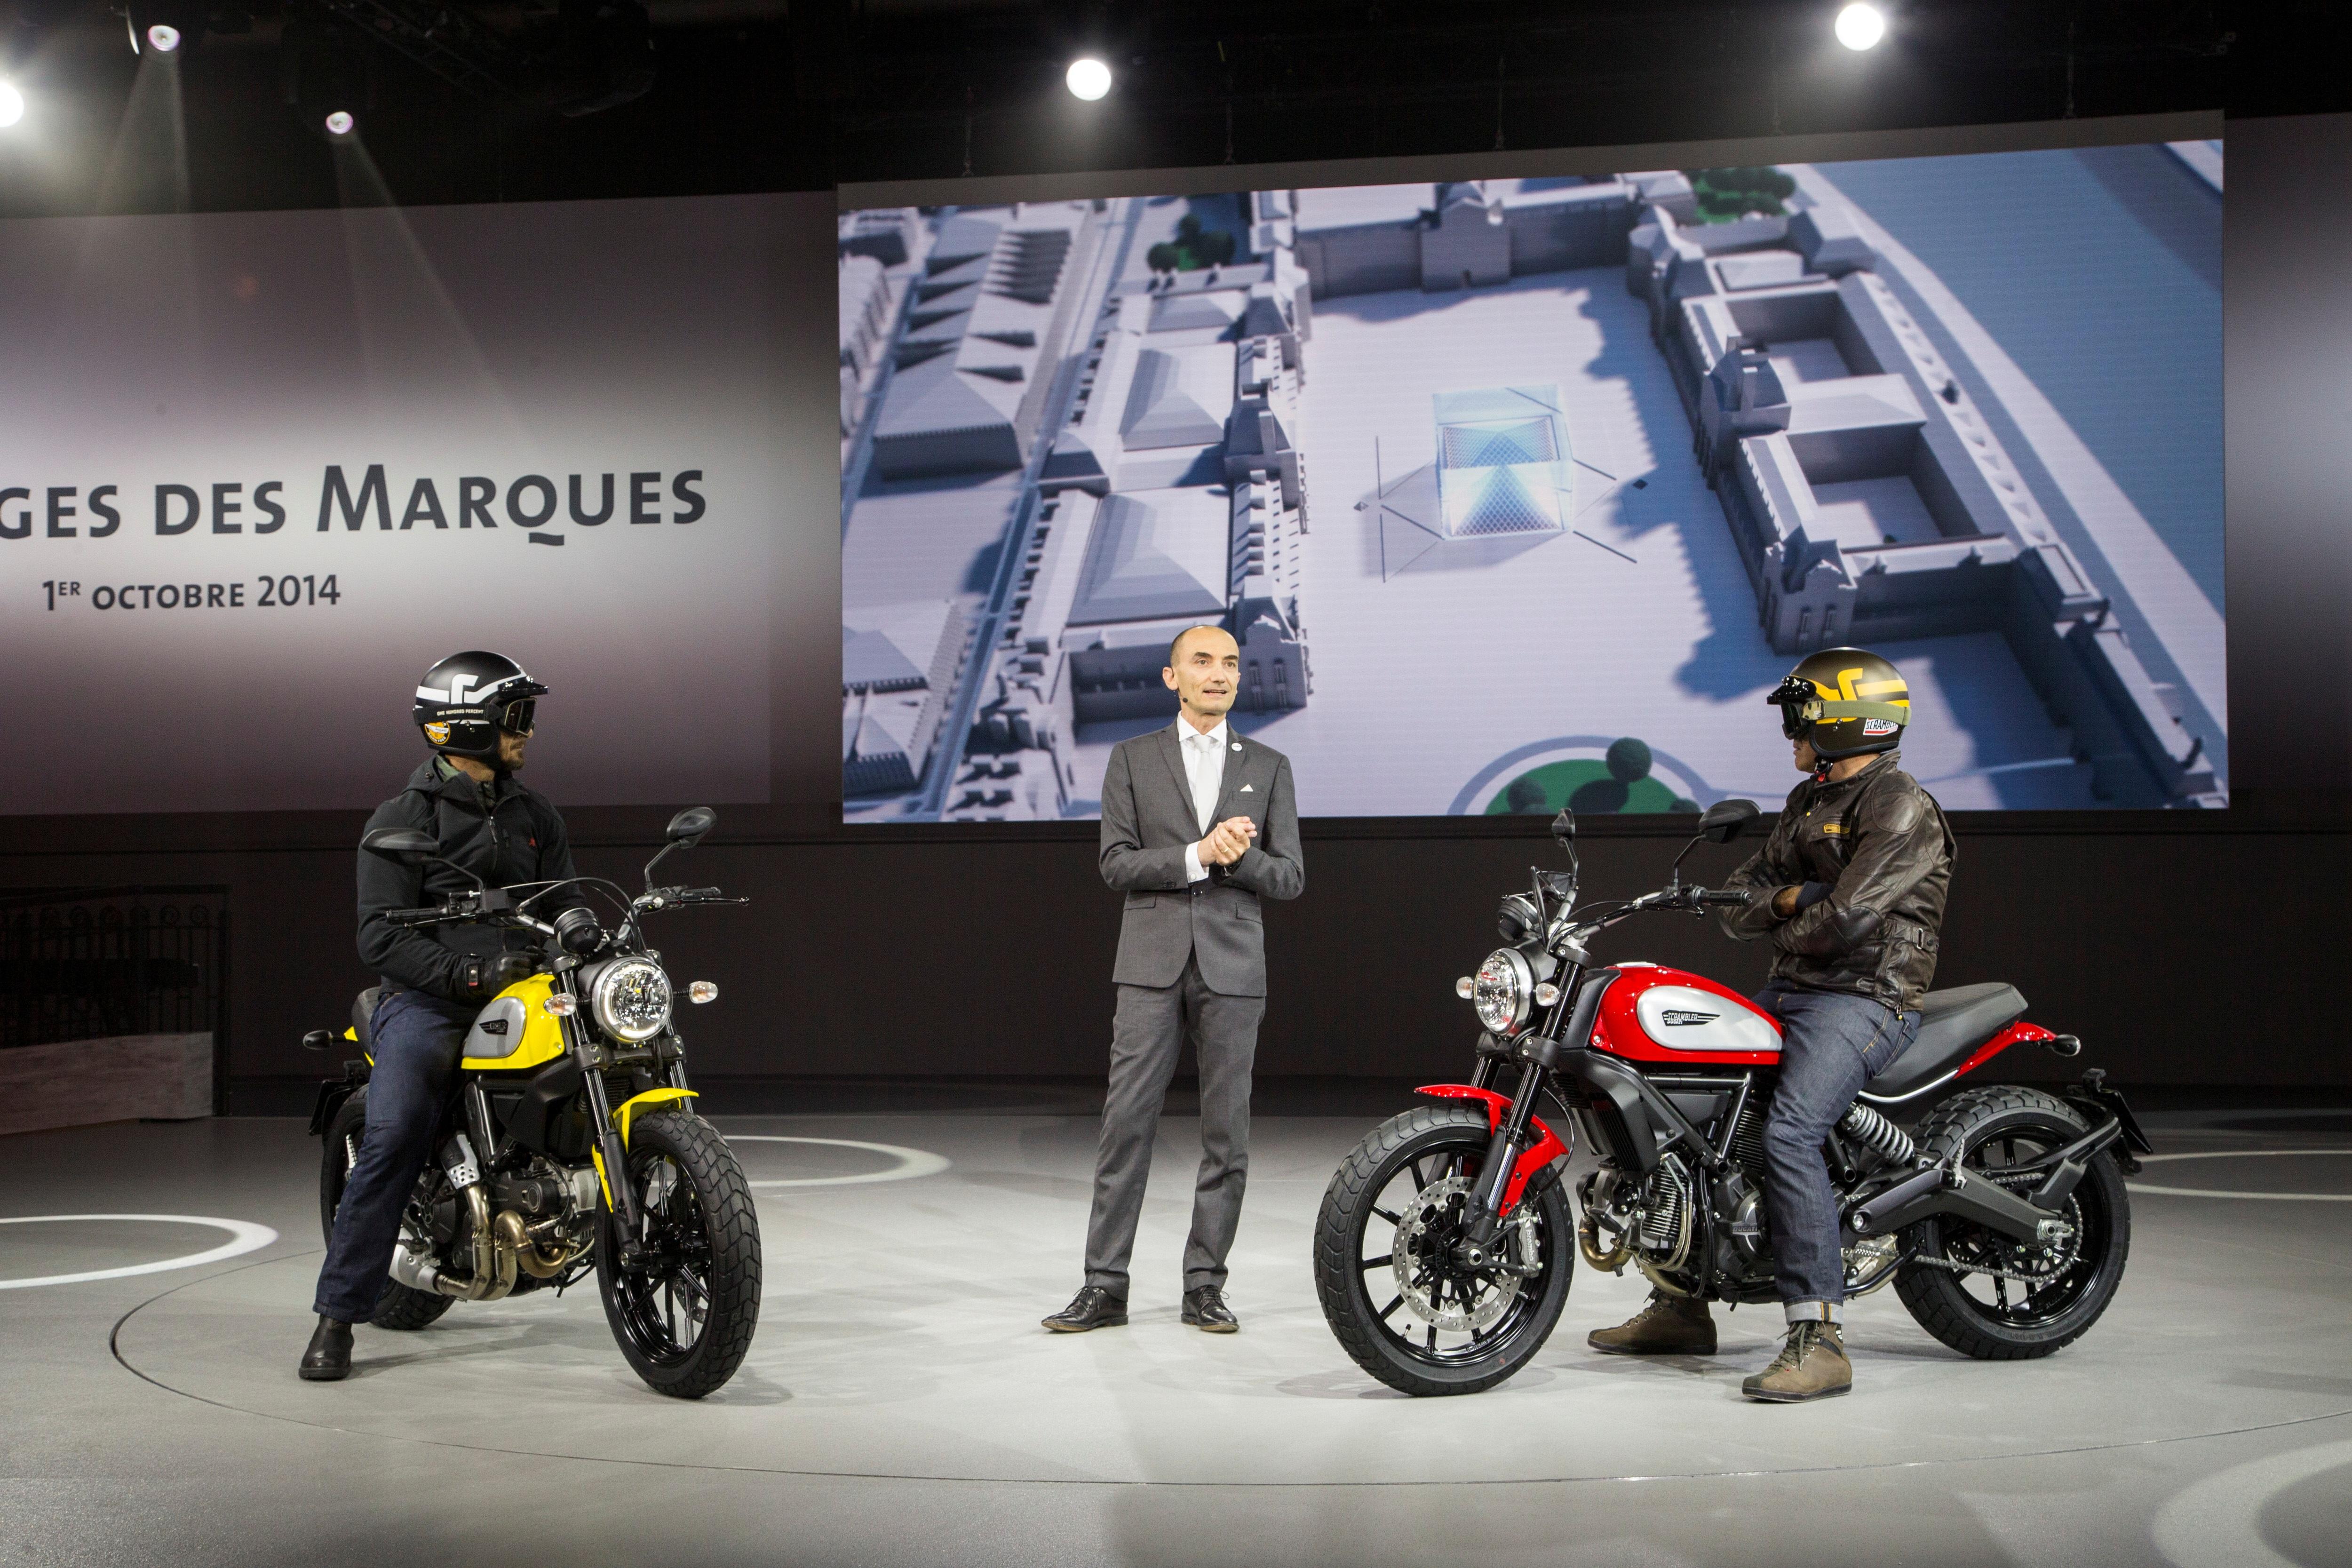 Scrambler Ducati manda in tilt il web